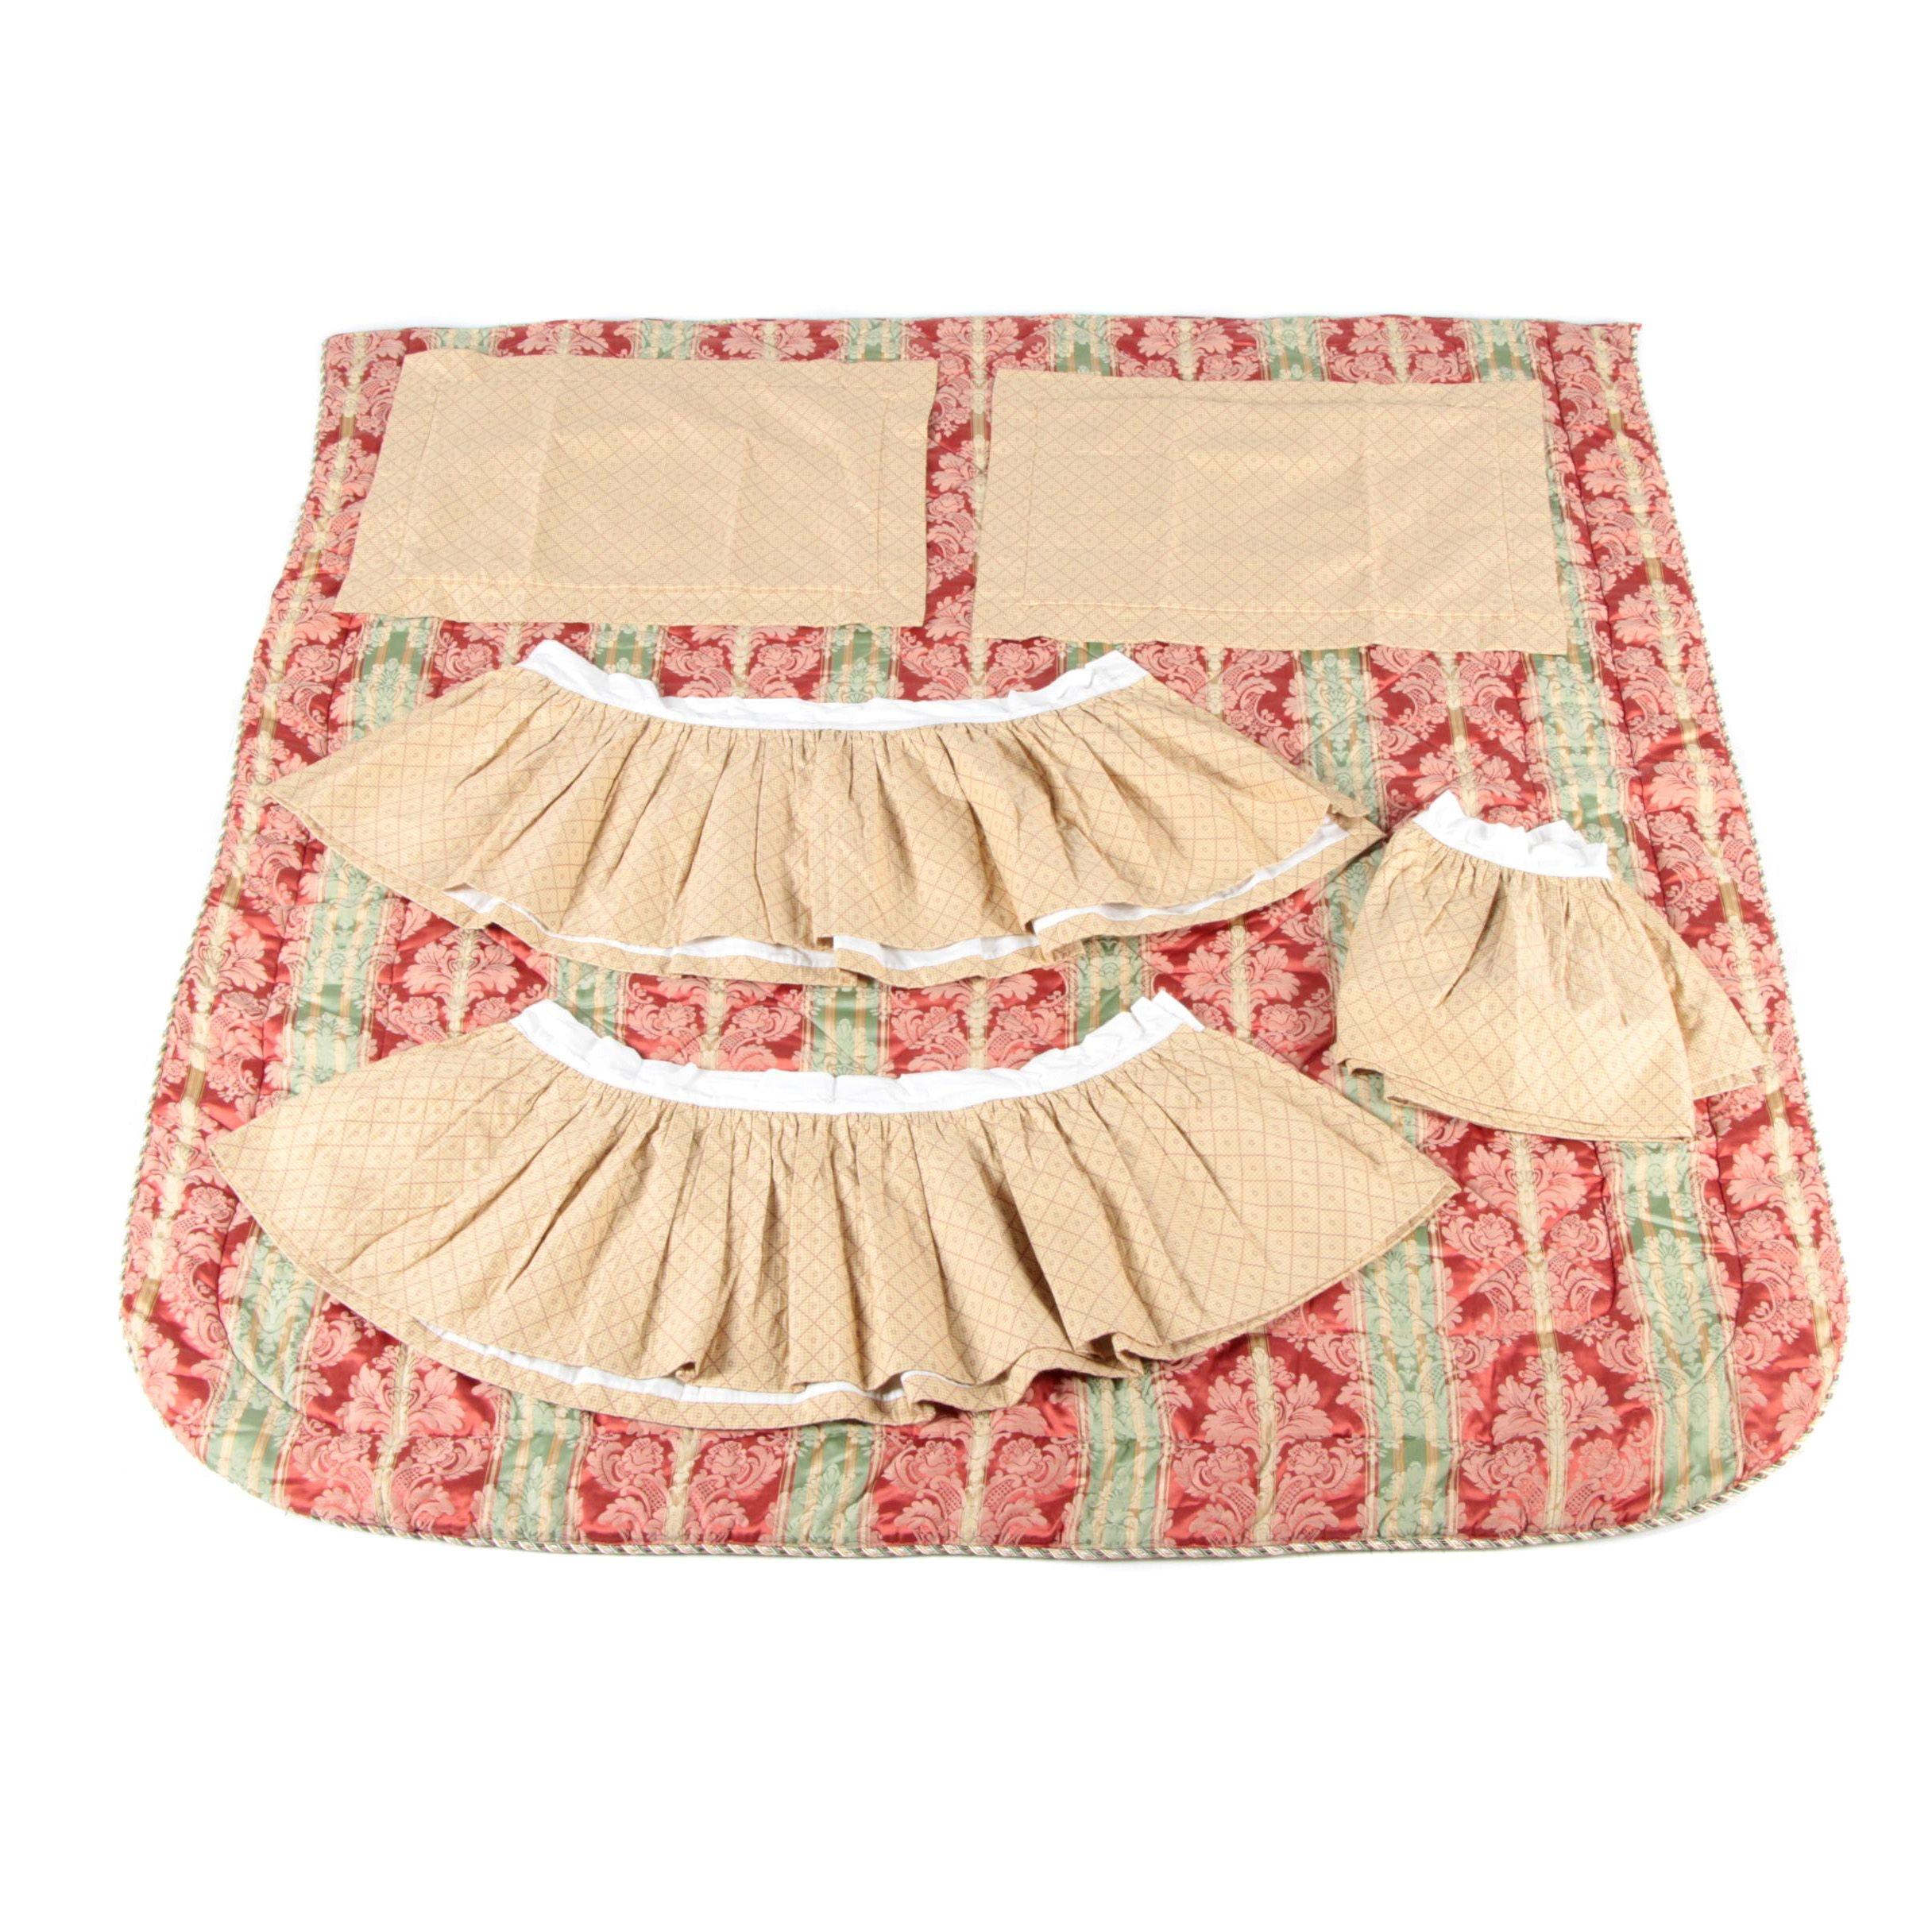 Custom Made Damask Bedding Set